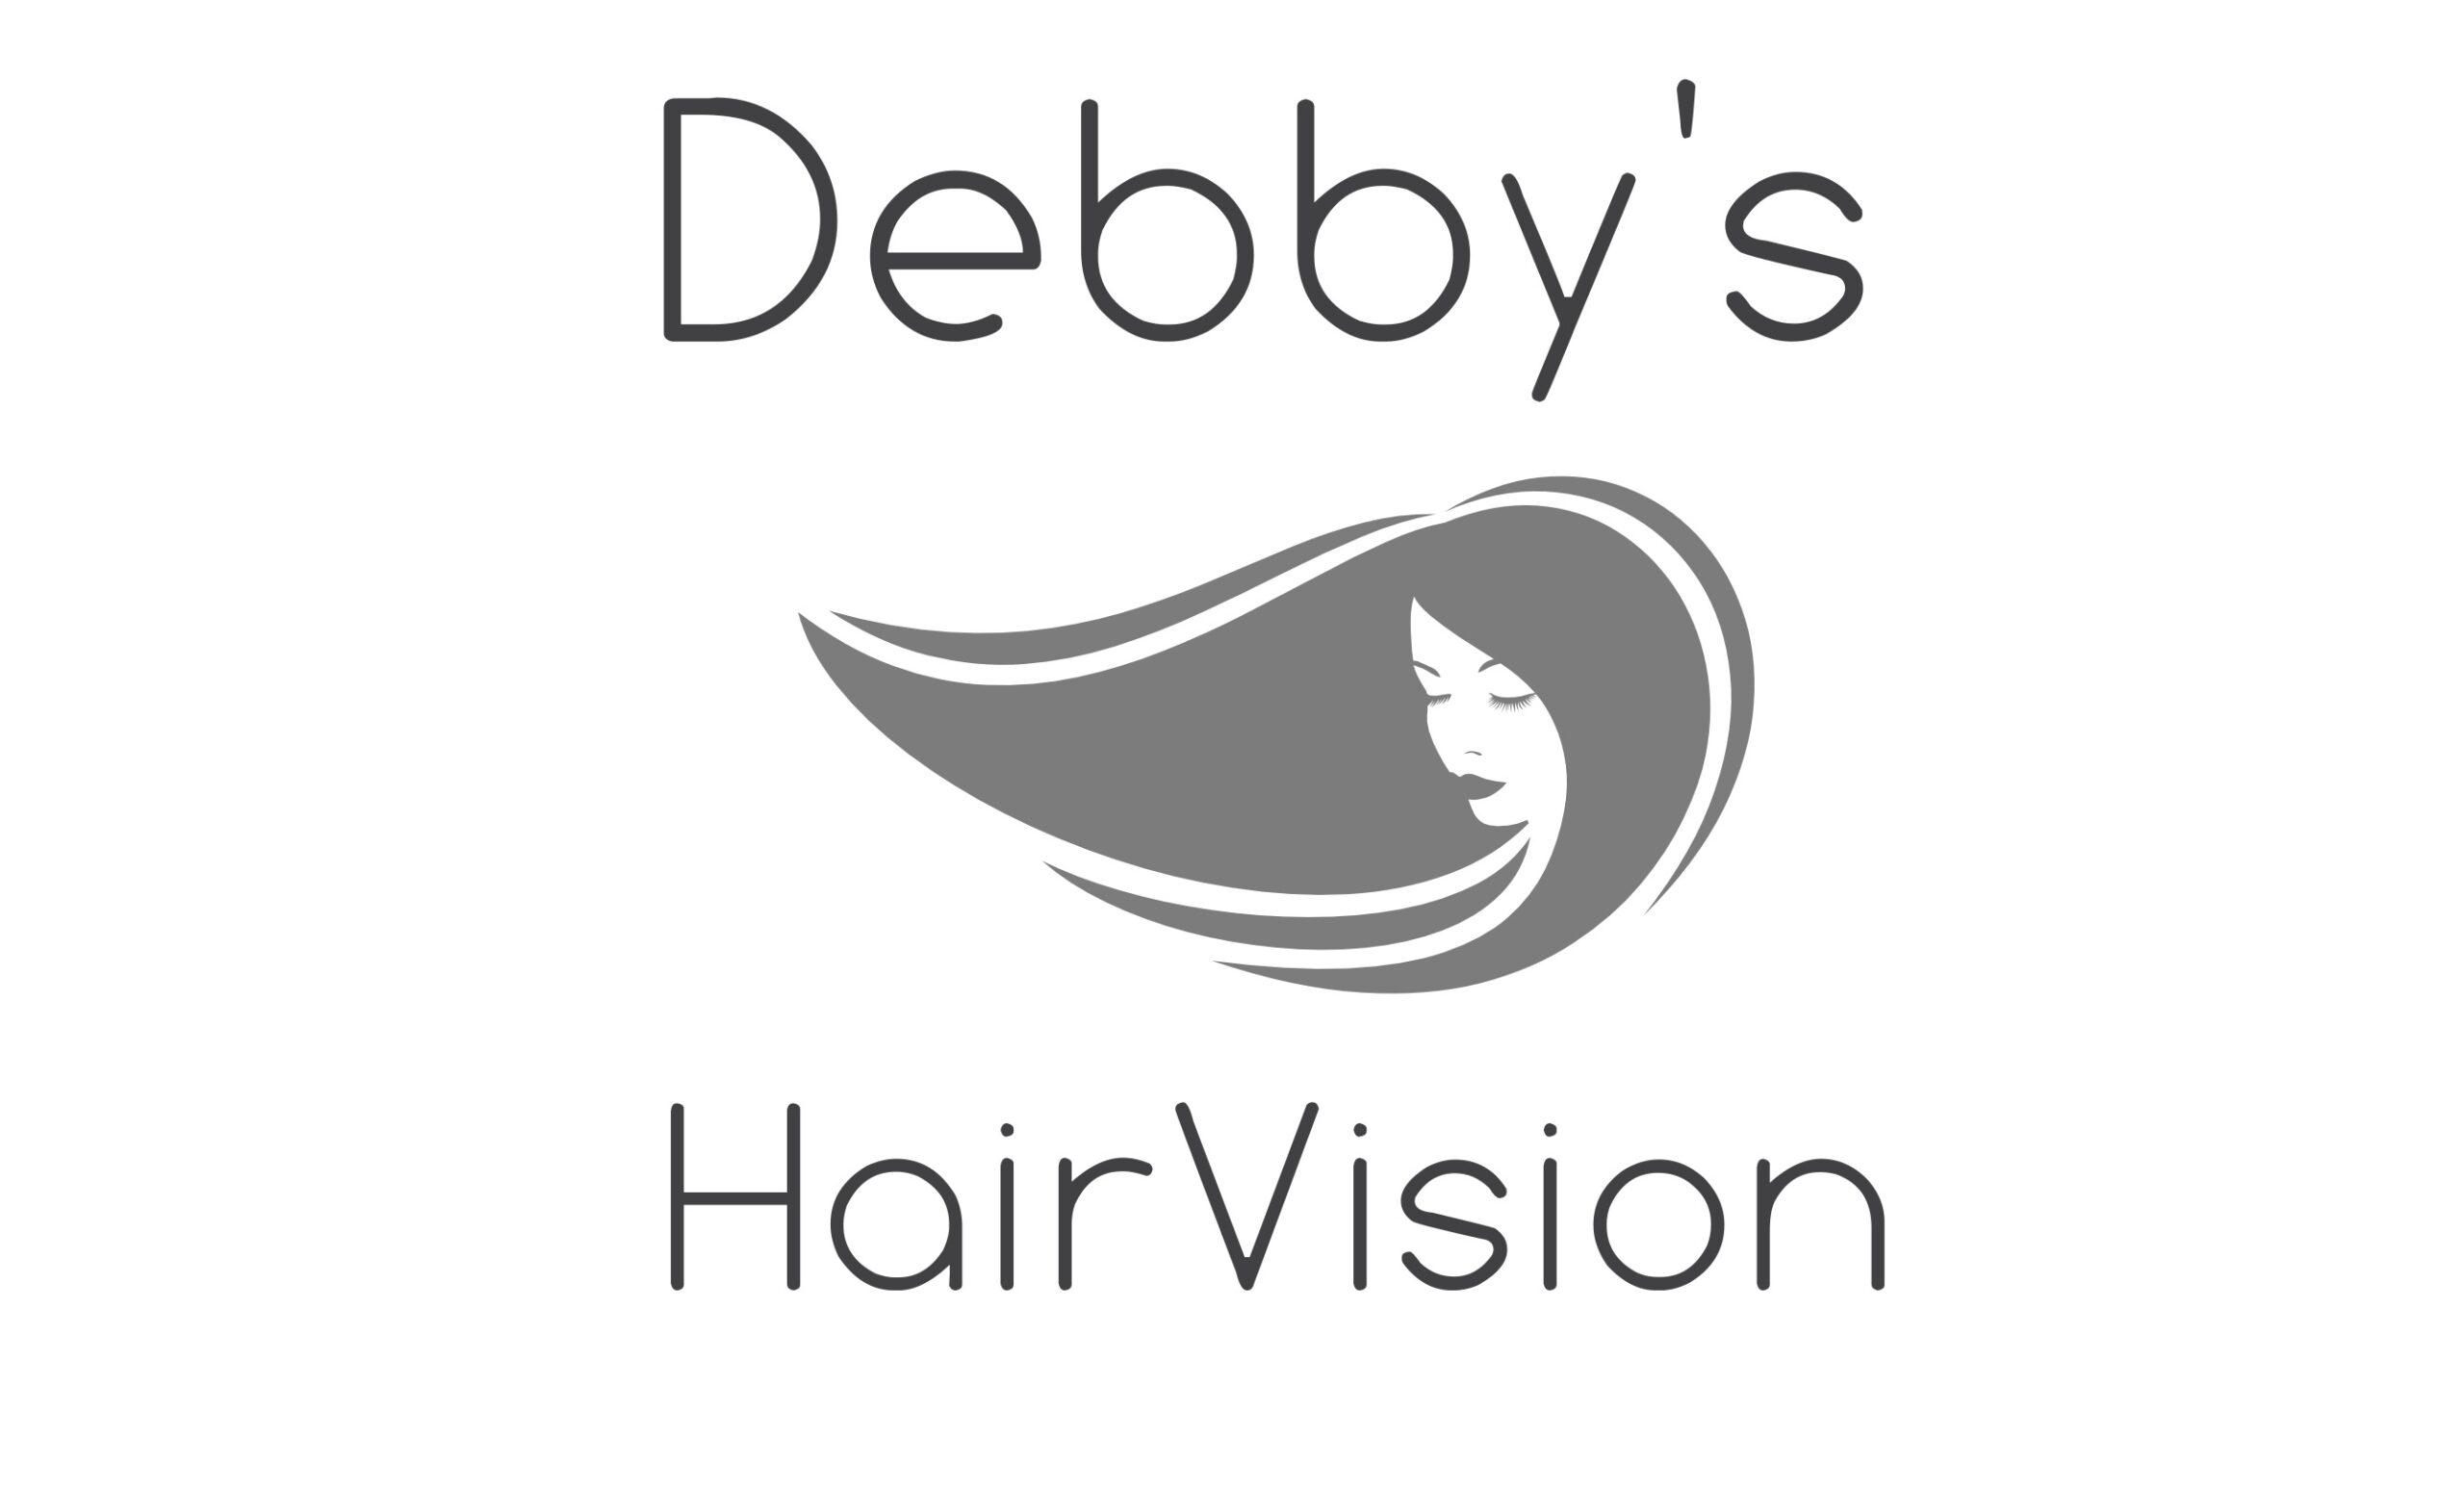 Debby's HairVision